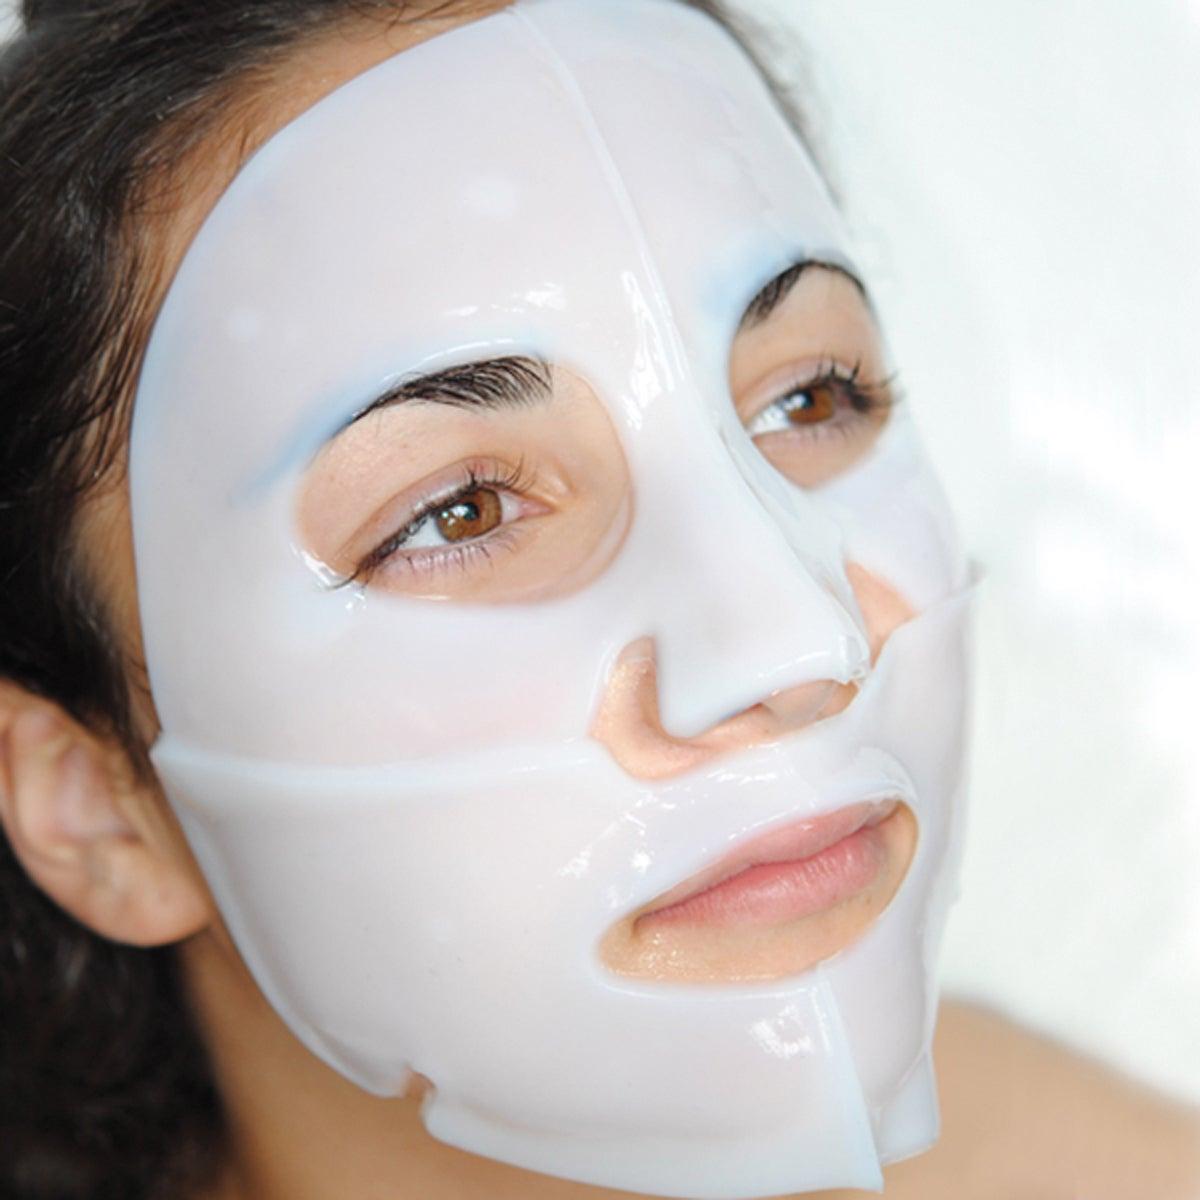 FreshLook Collagen Sheet Face Mask (Pack of 2)